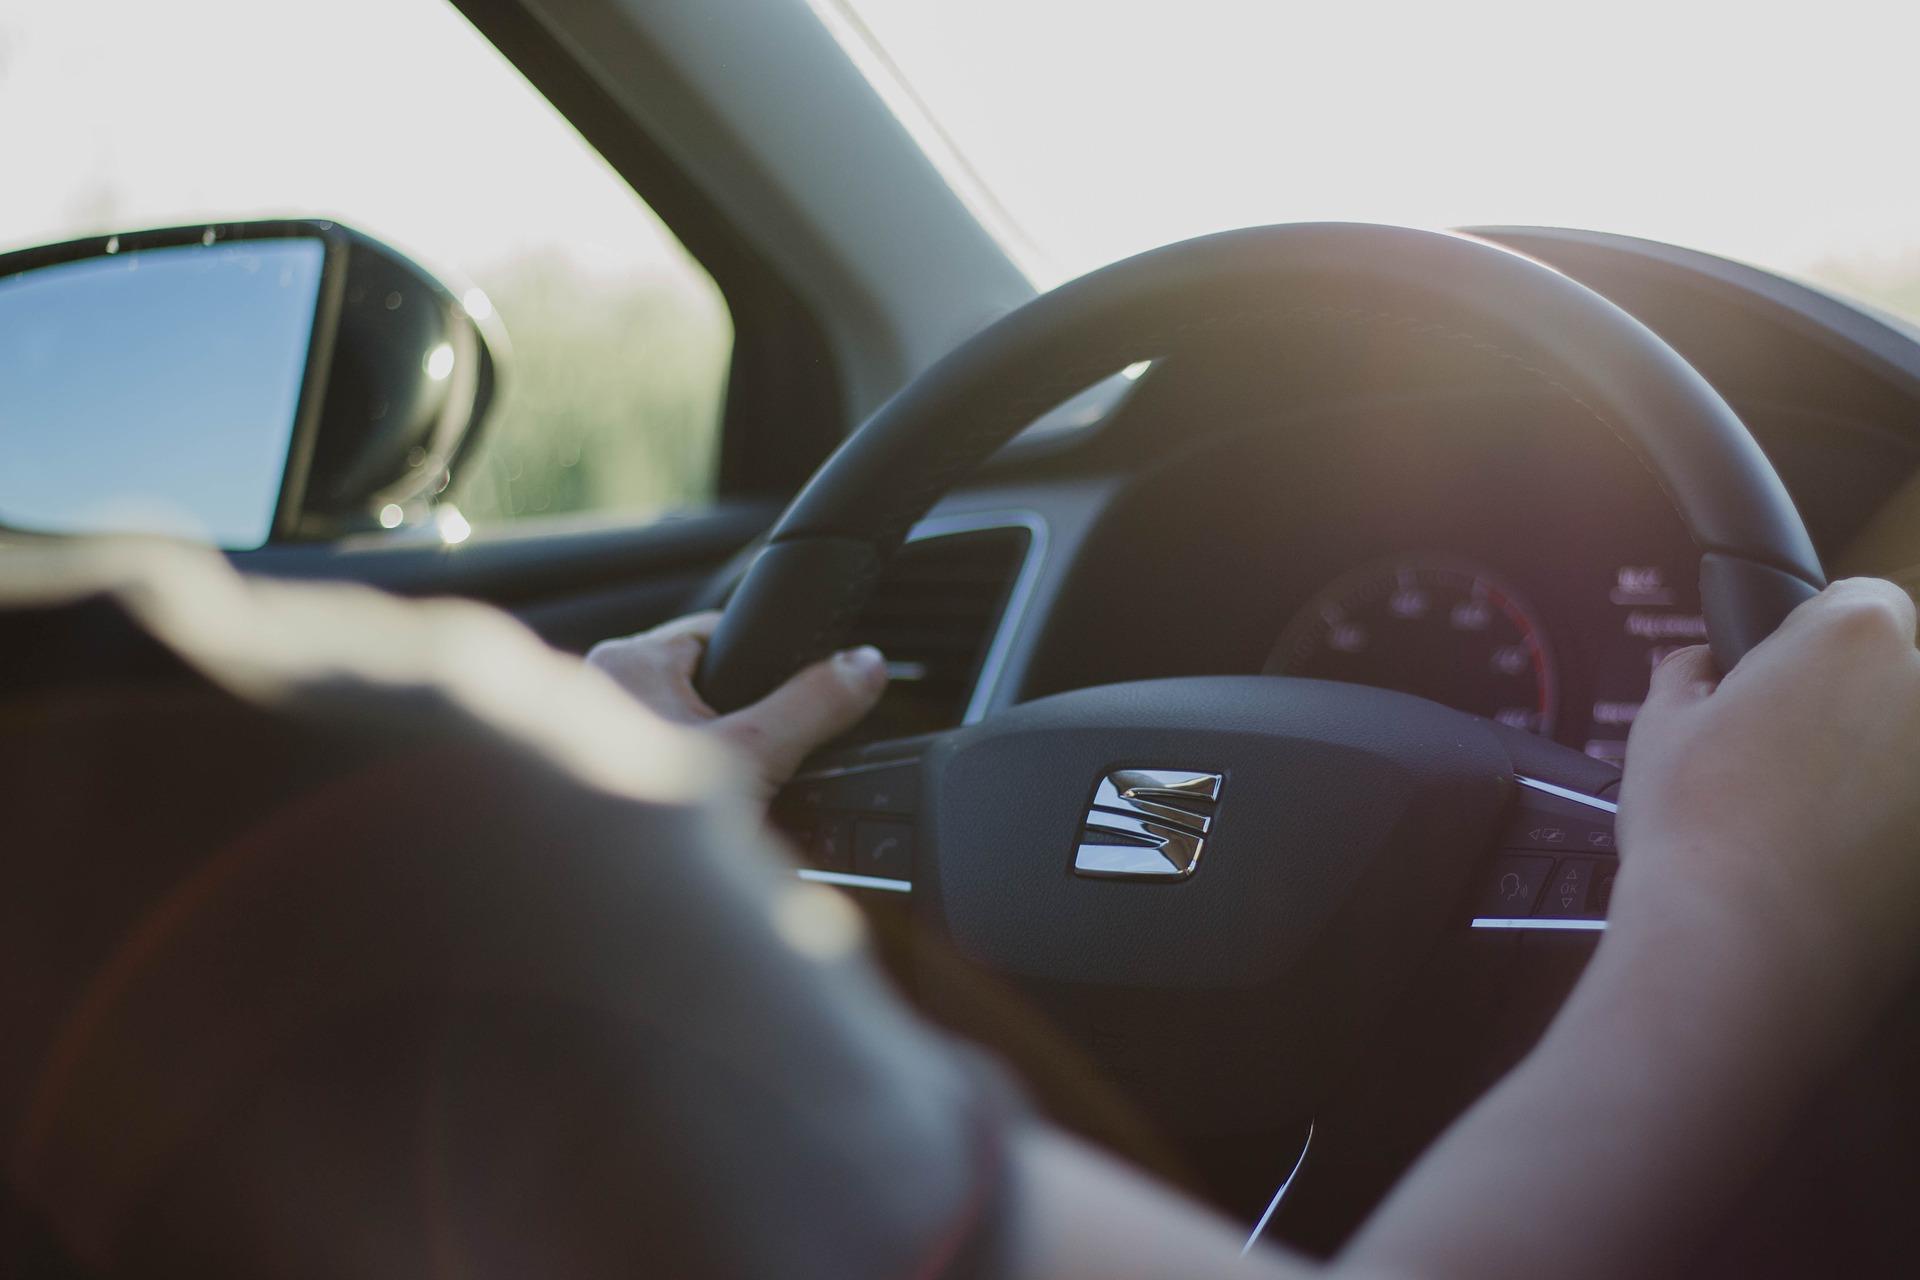 sprign driving.jpg (238 KB)